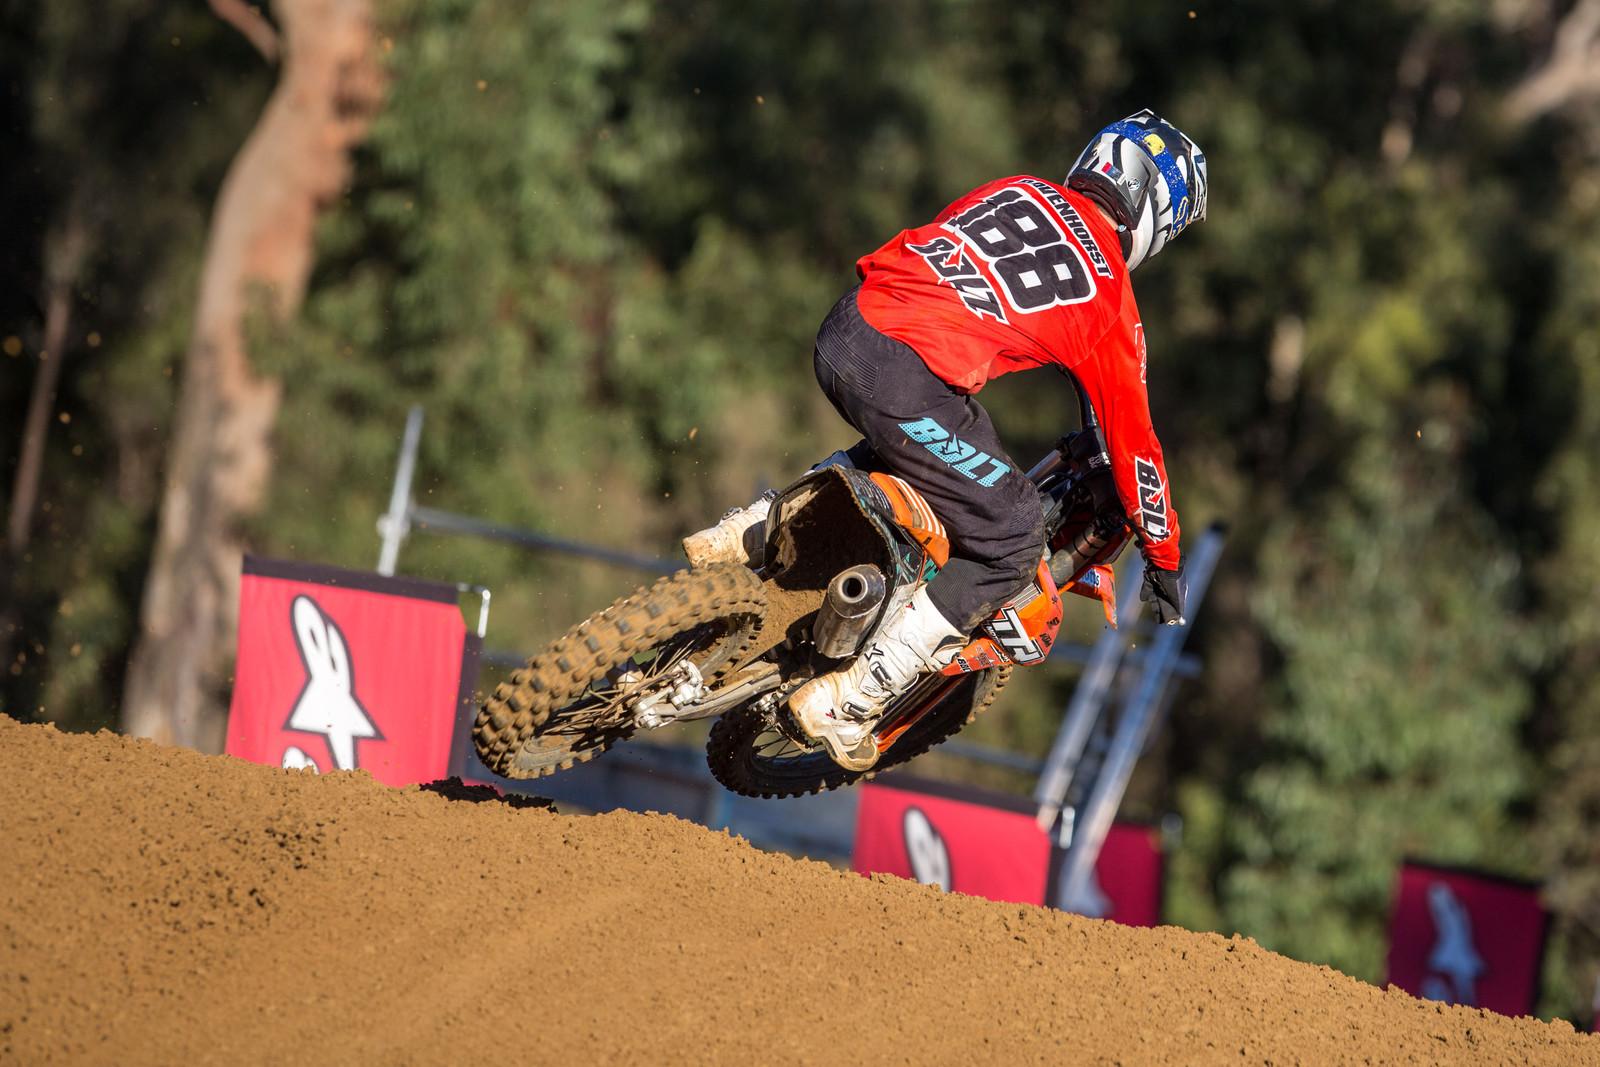 Tom Ravenhorst - Australian Motul MX Championships: Round 6, Nowra - Motocross Pictures - Vital MX